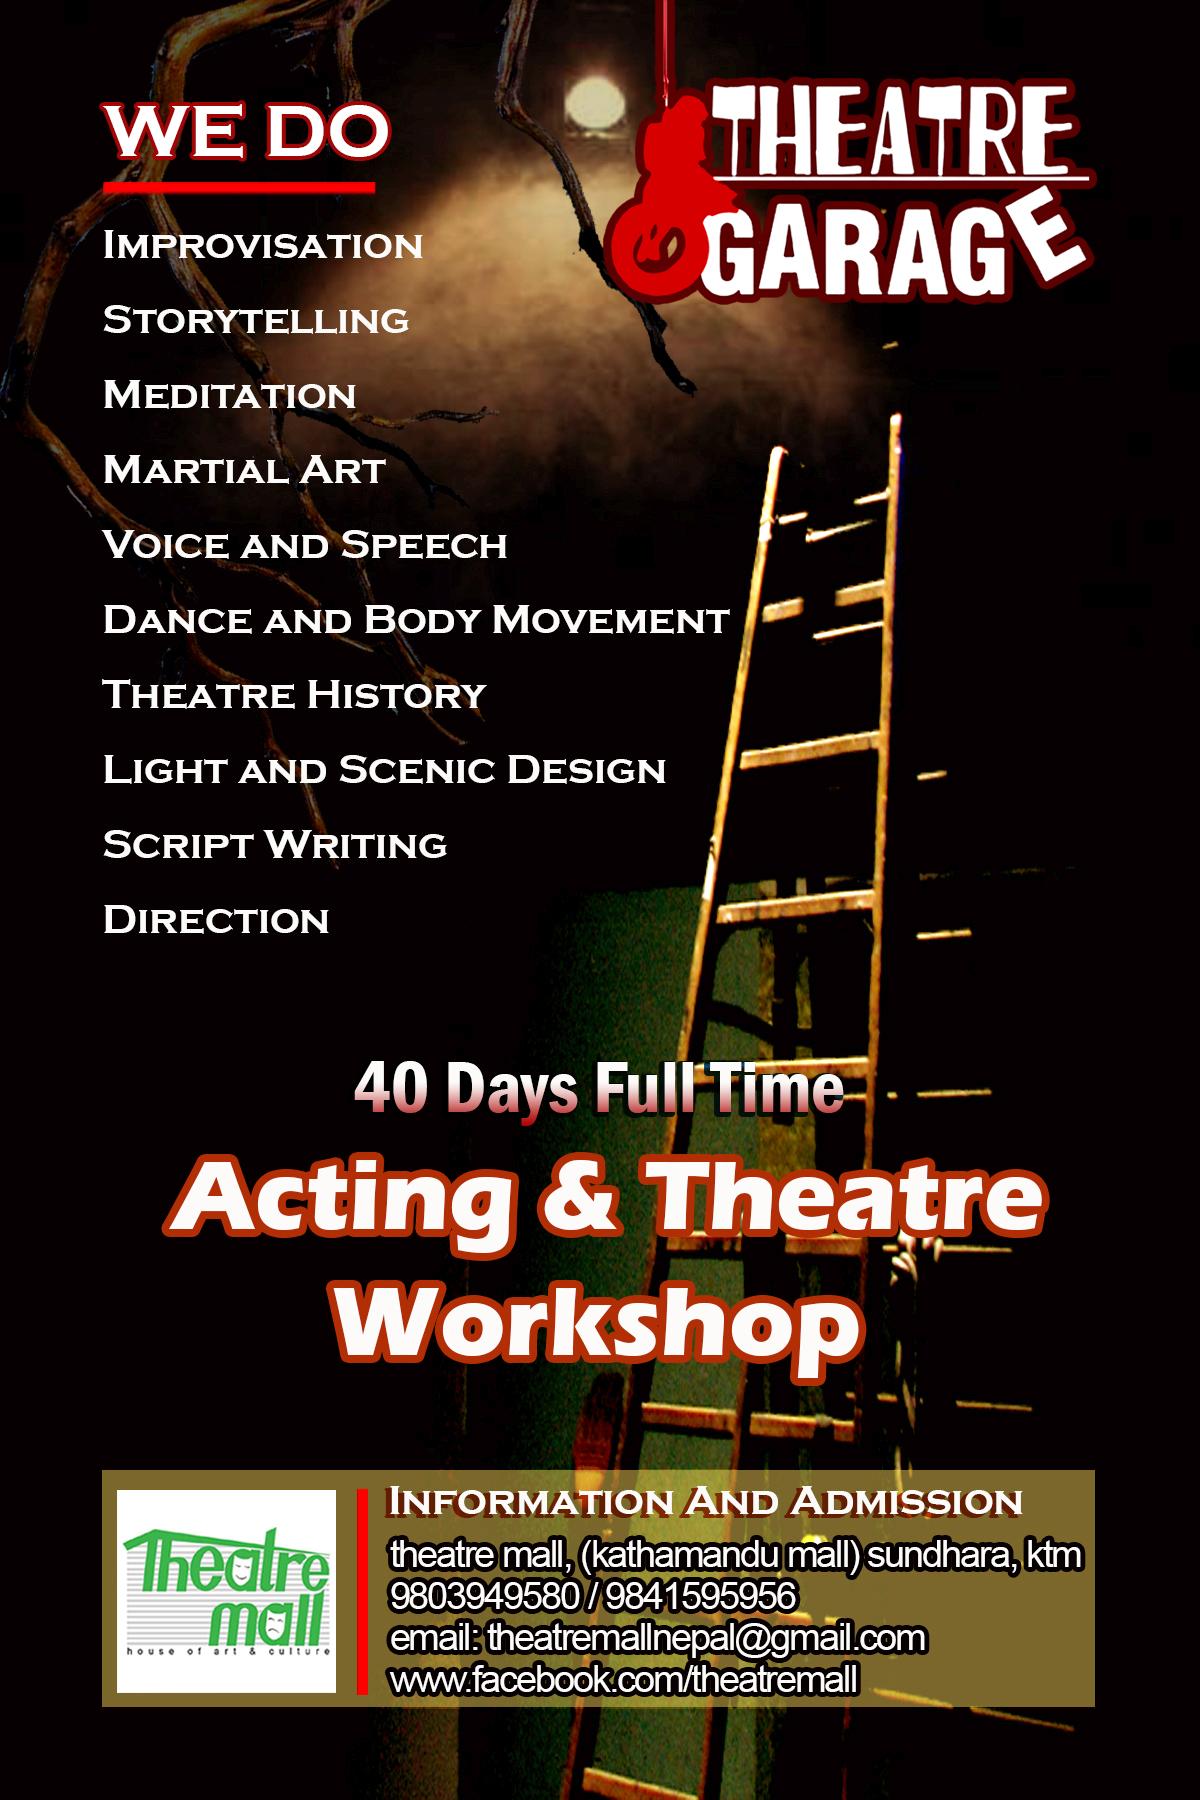 <p>Theatre Garage : Acting & Theatre Workshop</p>